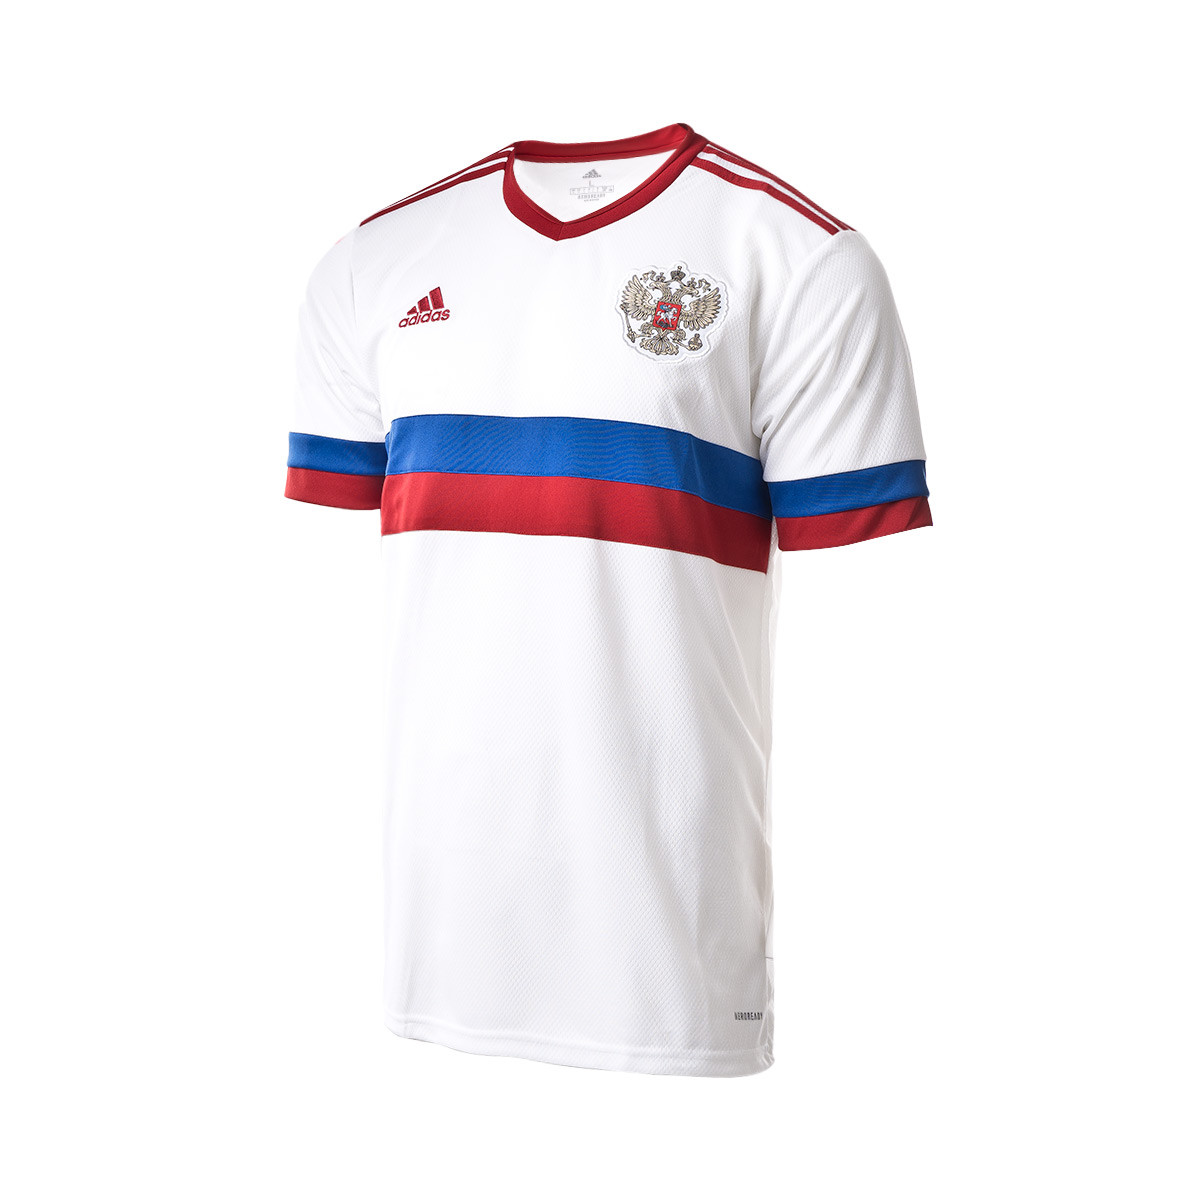 Maglia adidas Russia Secondo Kit 2020-2021